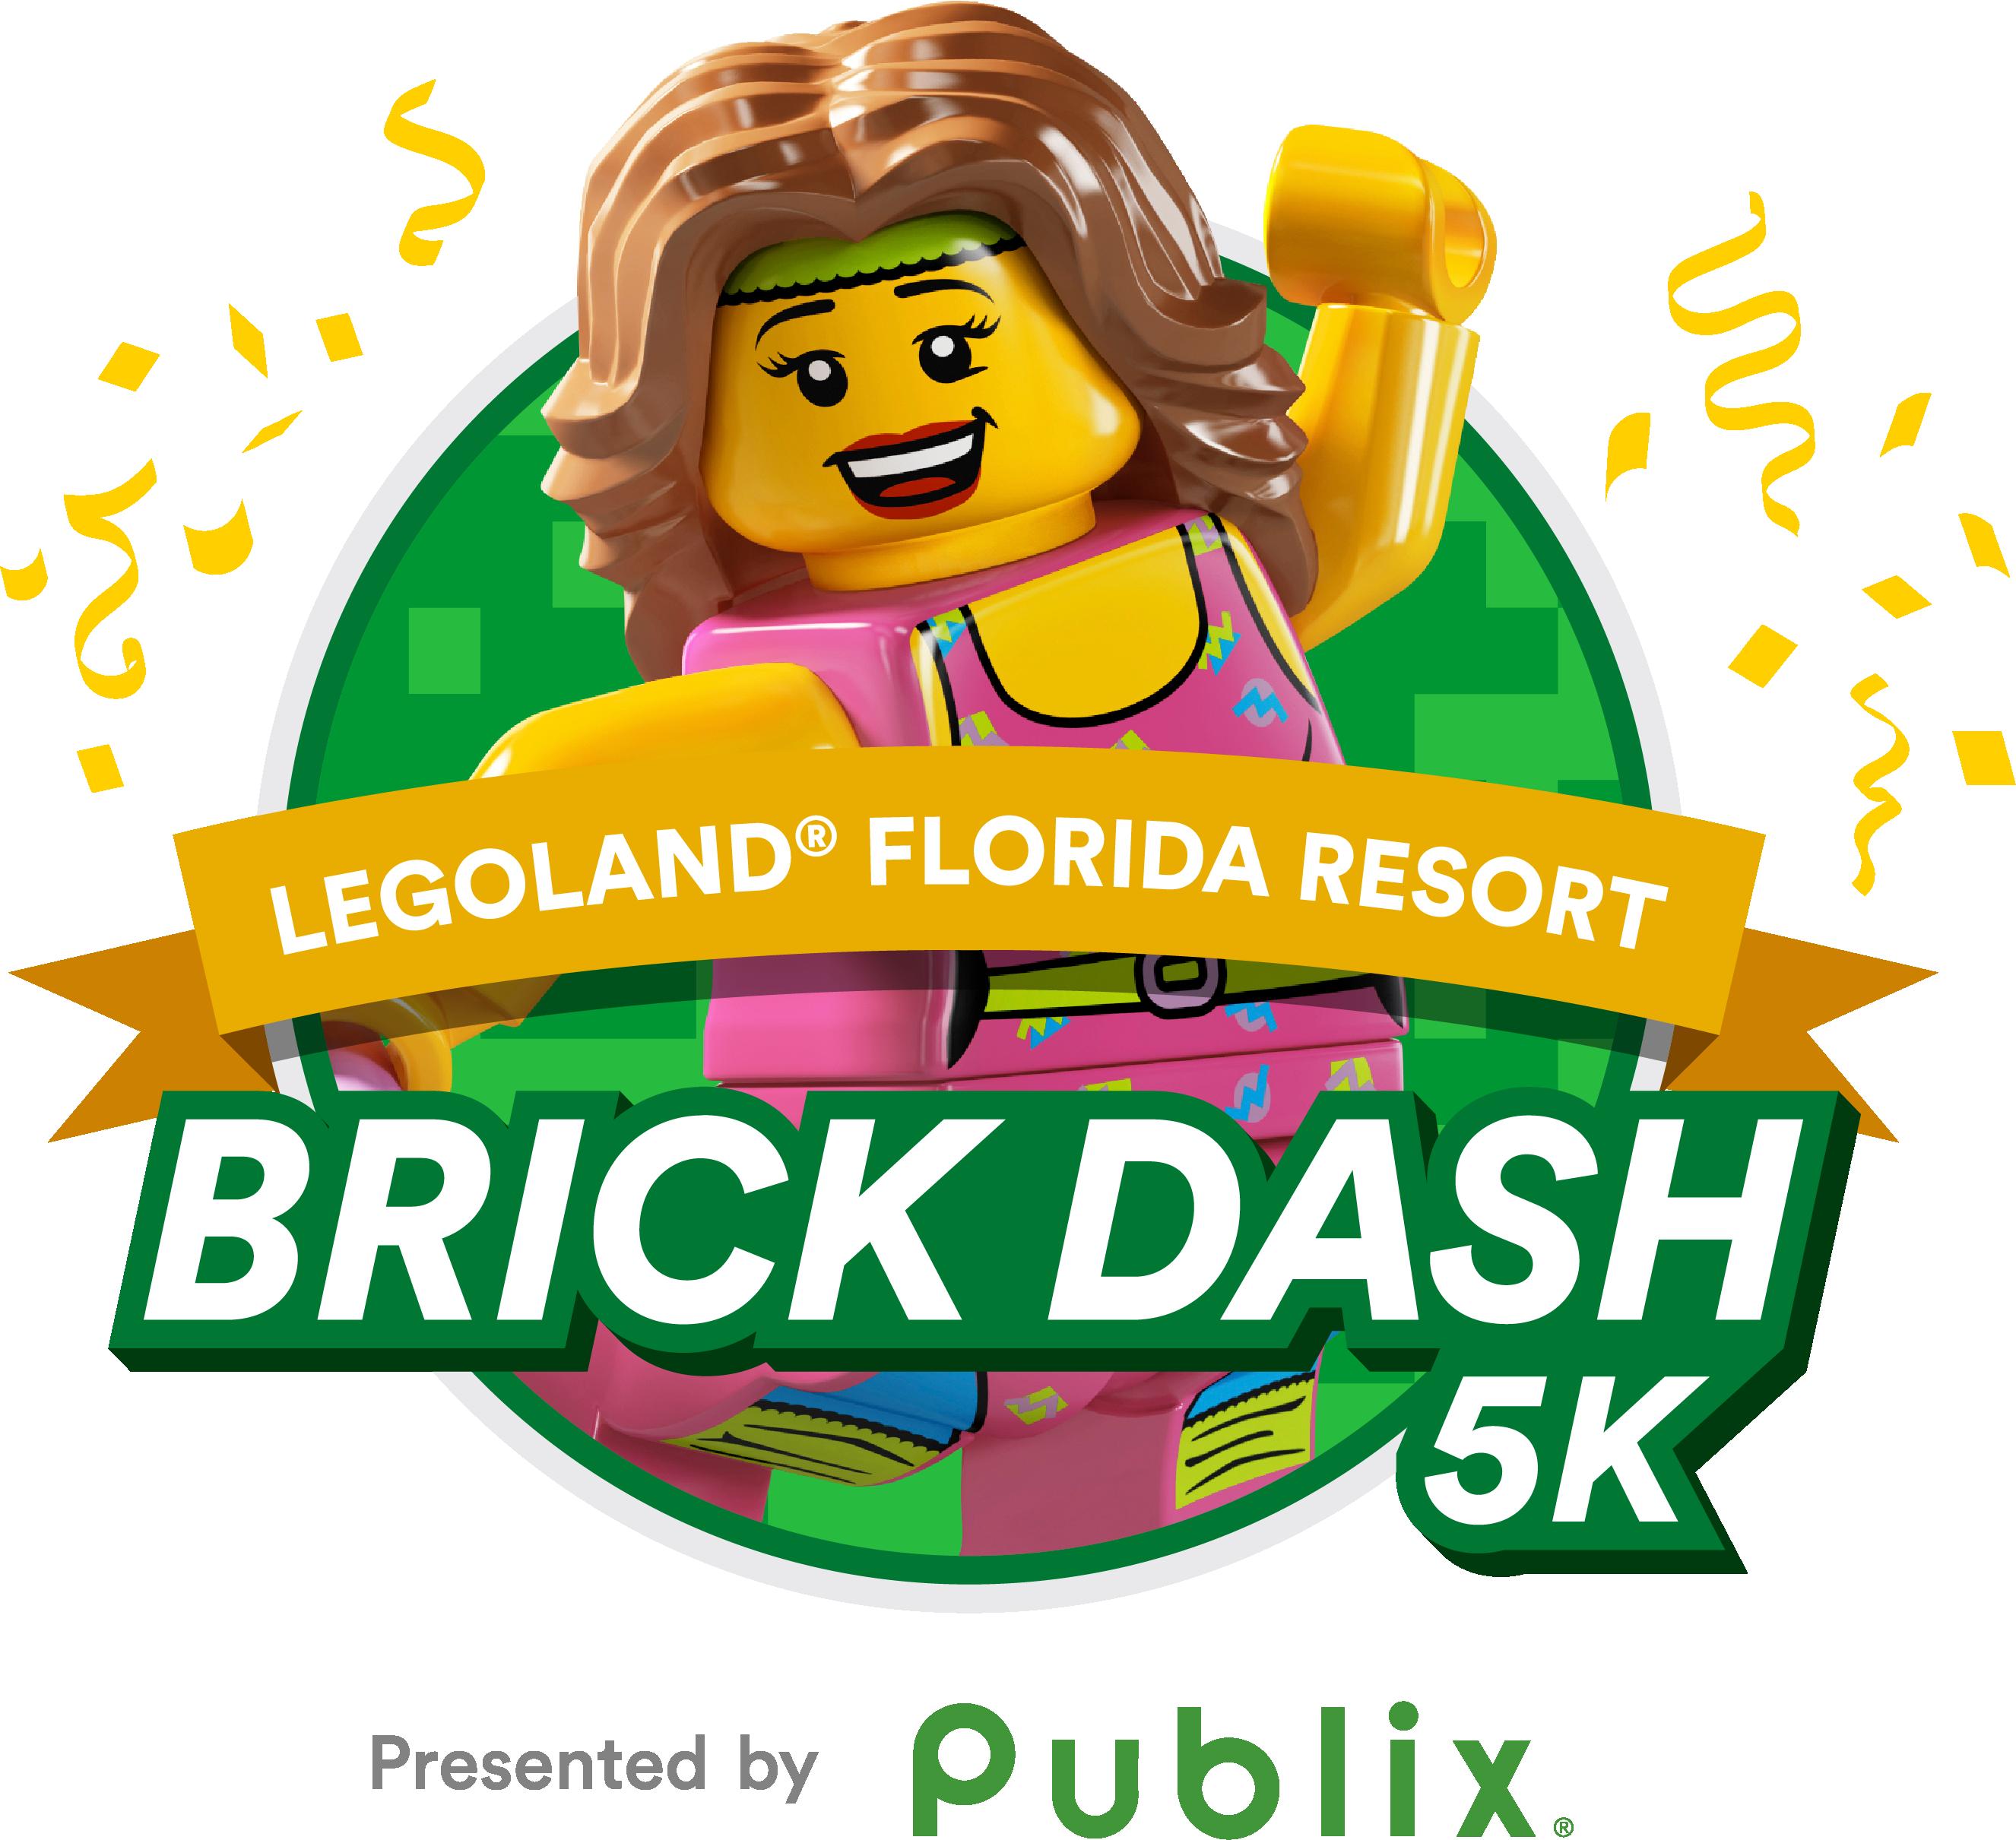 Brick Dash 5K